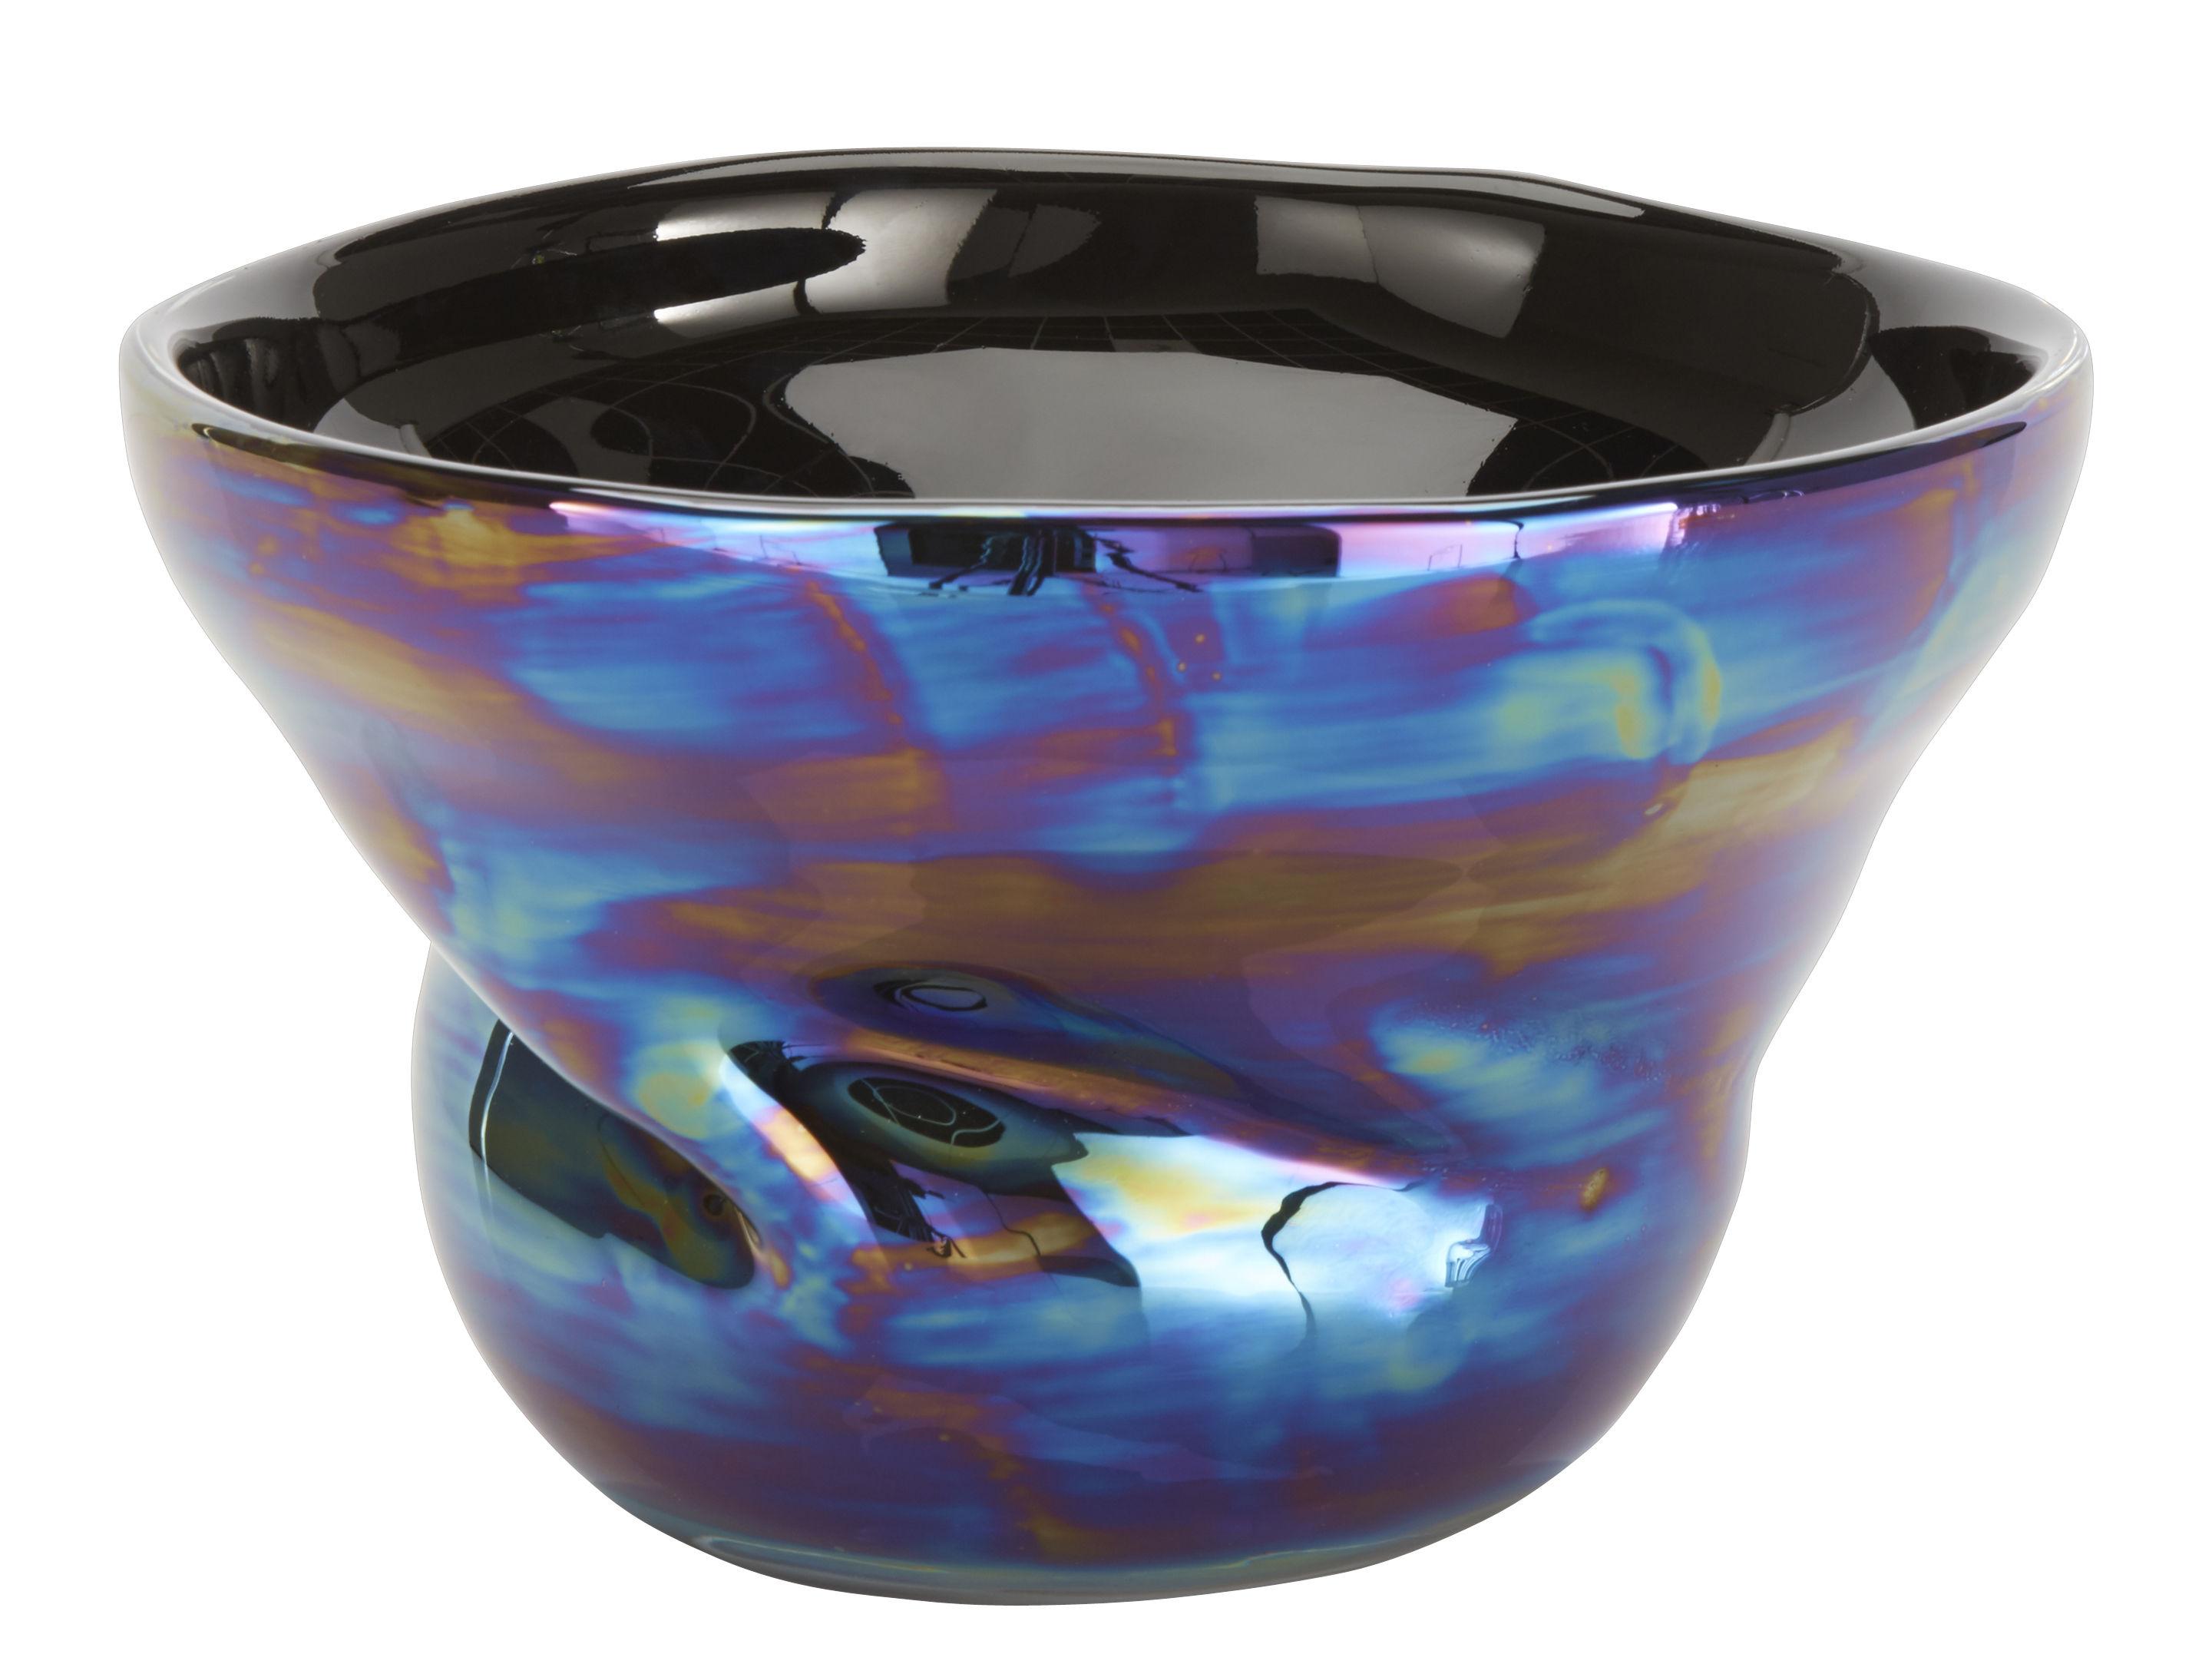 Warp Salad Bowl Fruit Bowl 28 Cm Iridescent Blue By